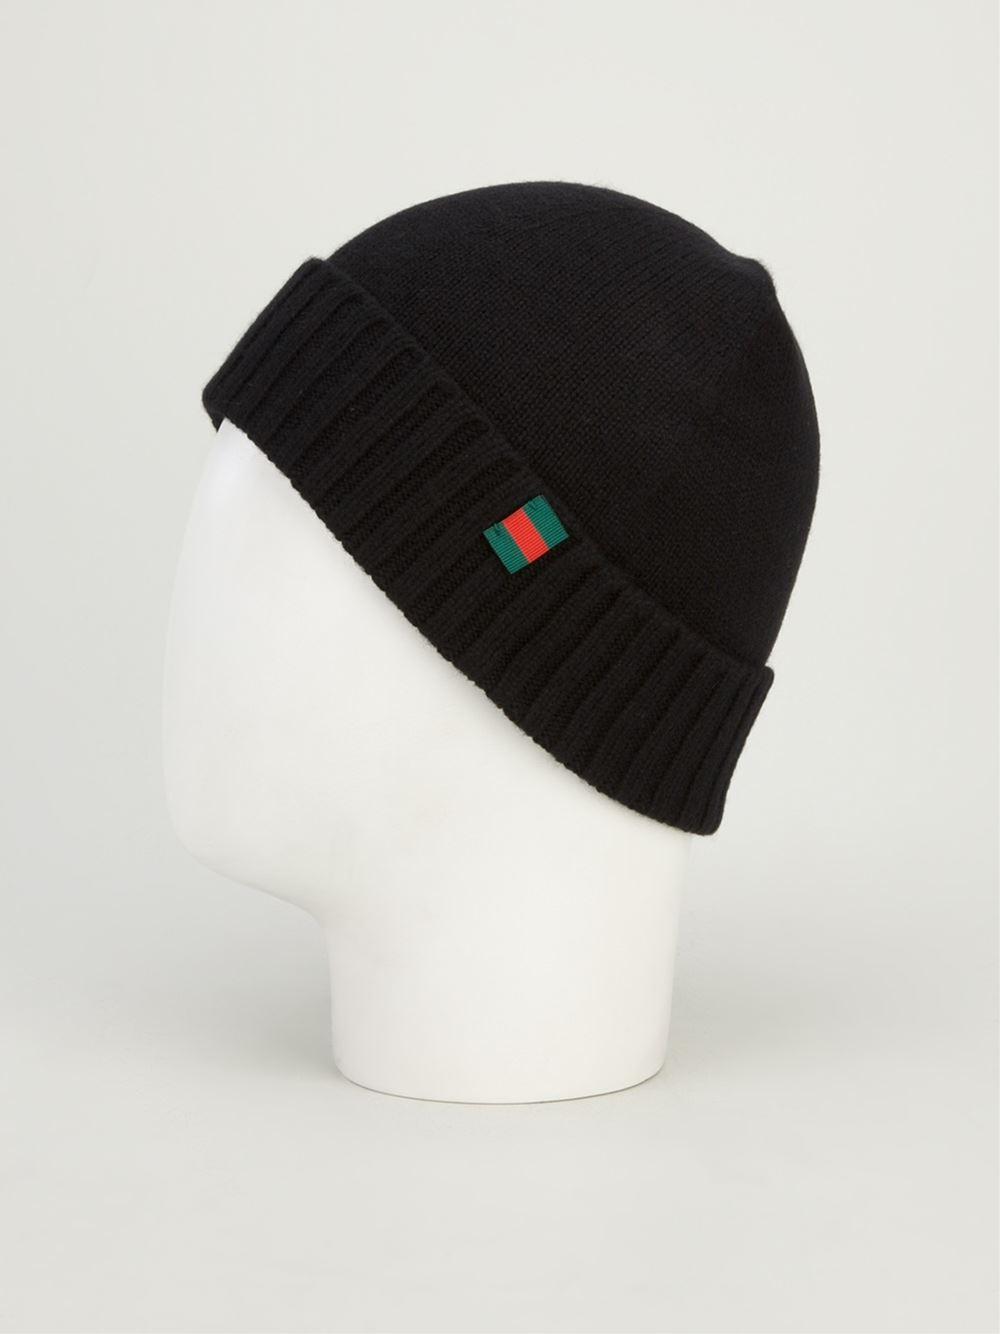 Lyst Gucci Beanie Hat In Black For Men